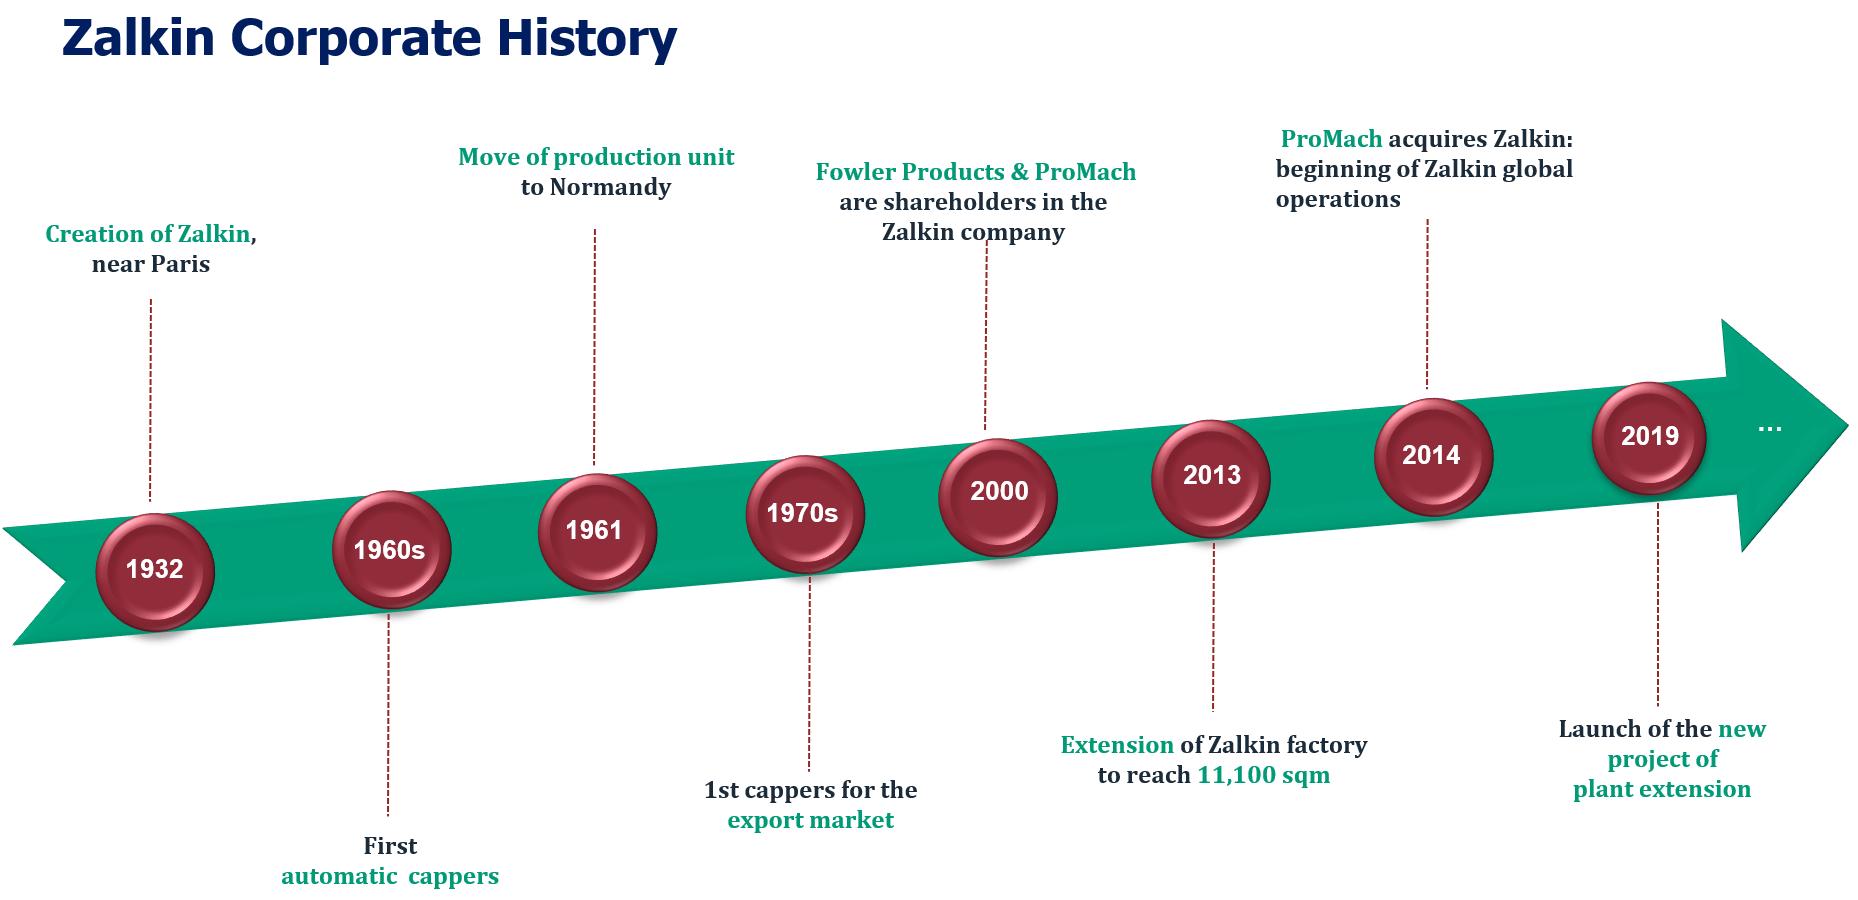 Zalkin Corporate History Timeline 2019 10